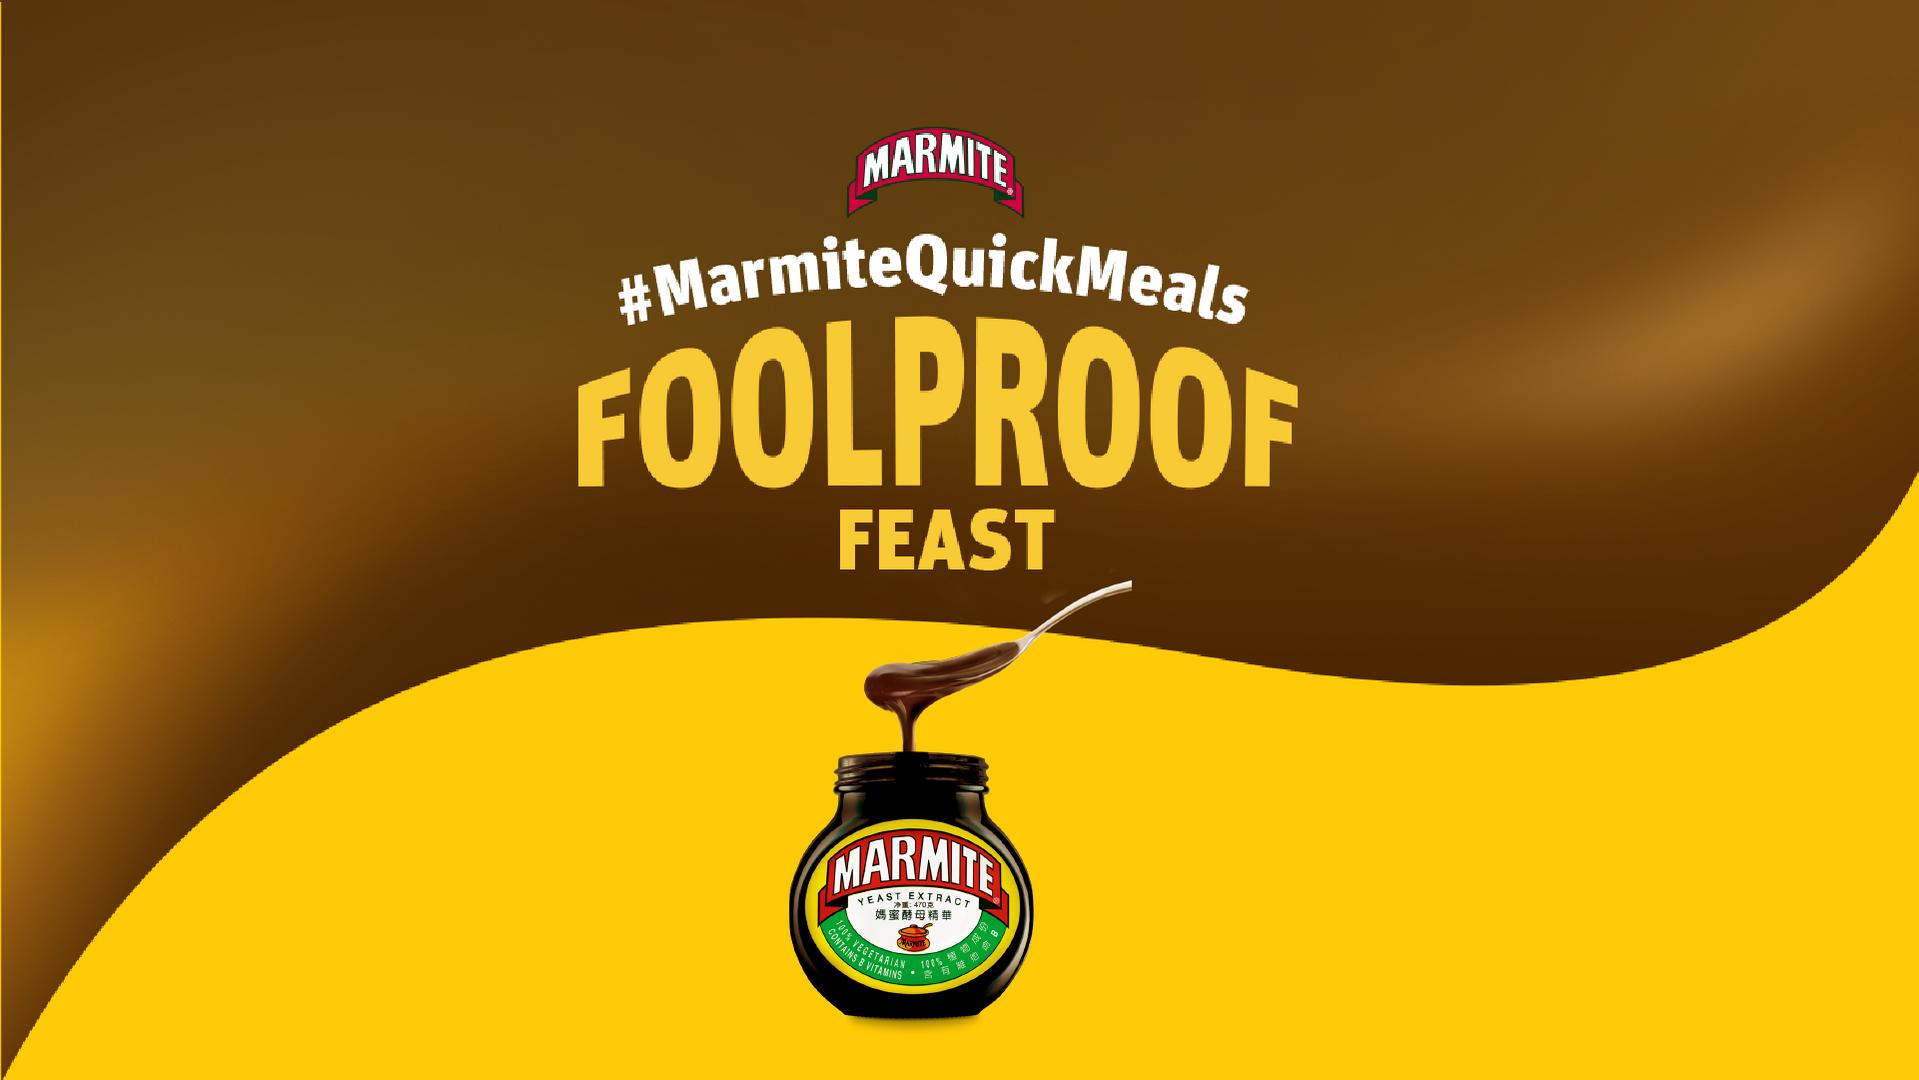 Marmite FoolProof Feast